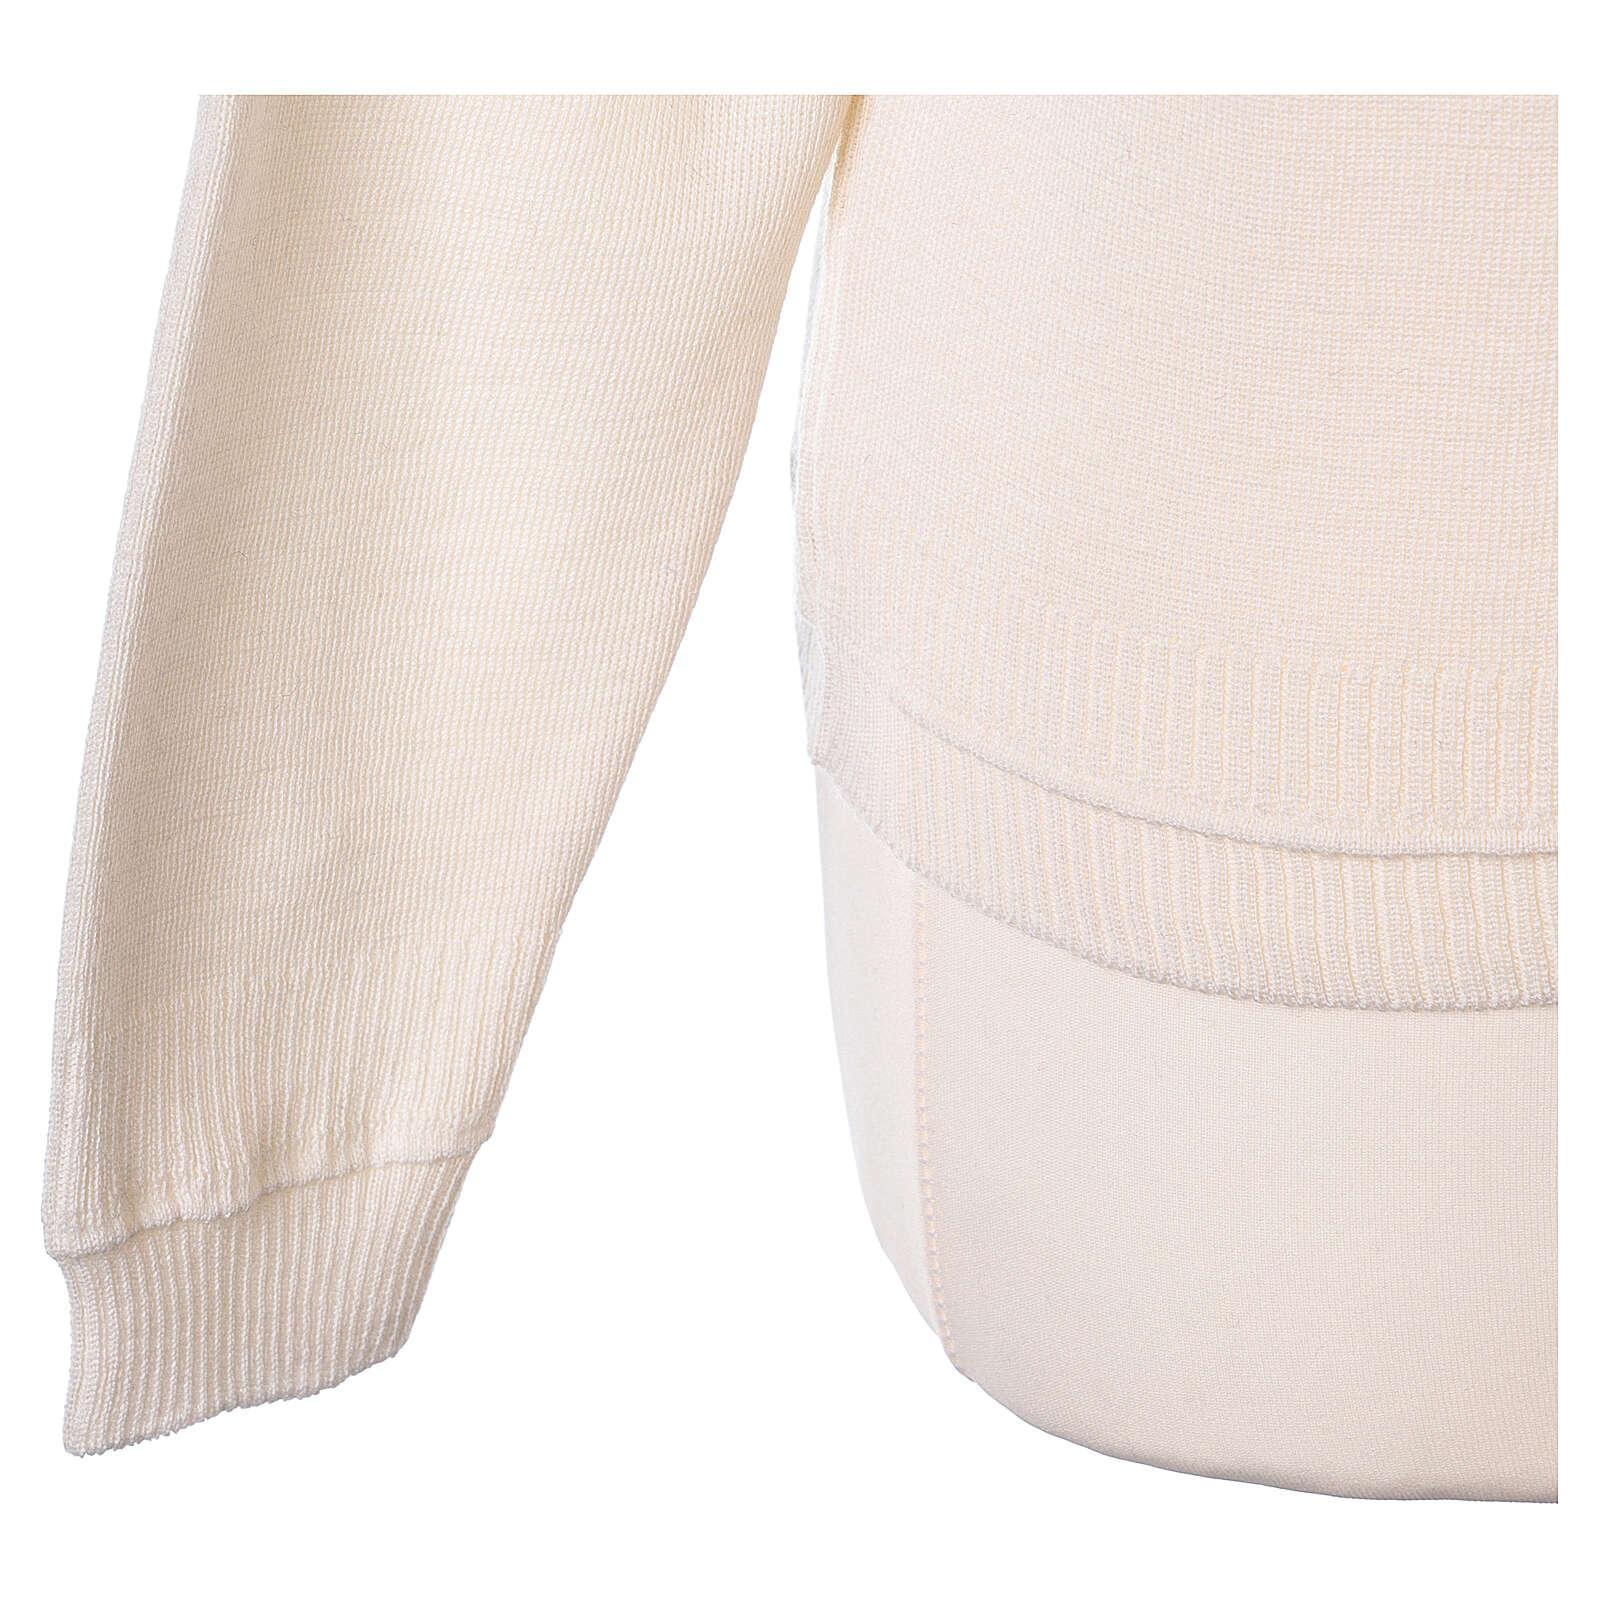 Cardigan court blanc 50% laine mérinos 50% acrylique soeur In Primis 4